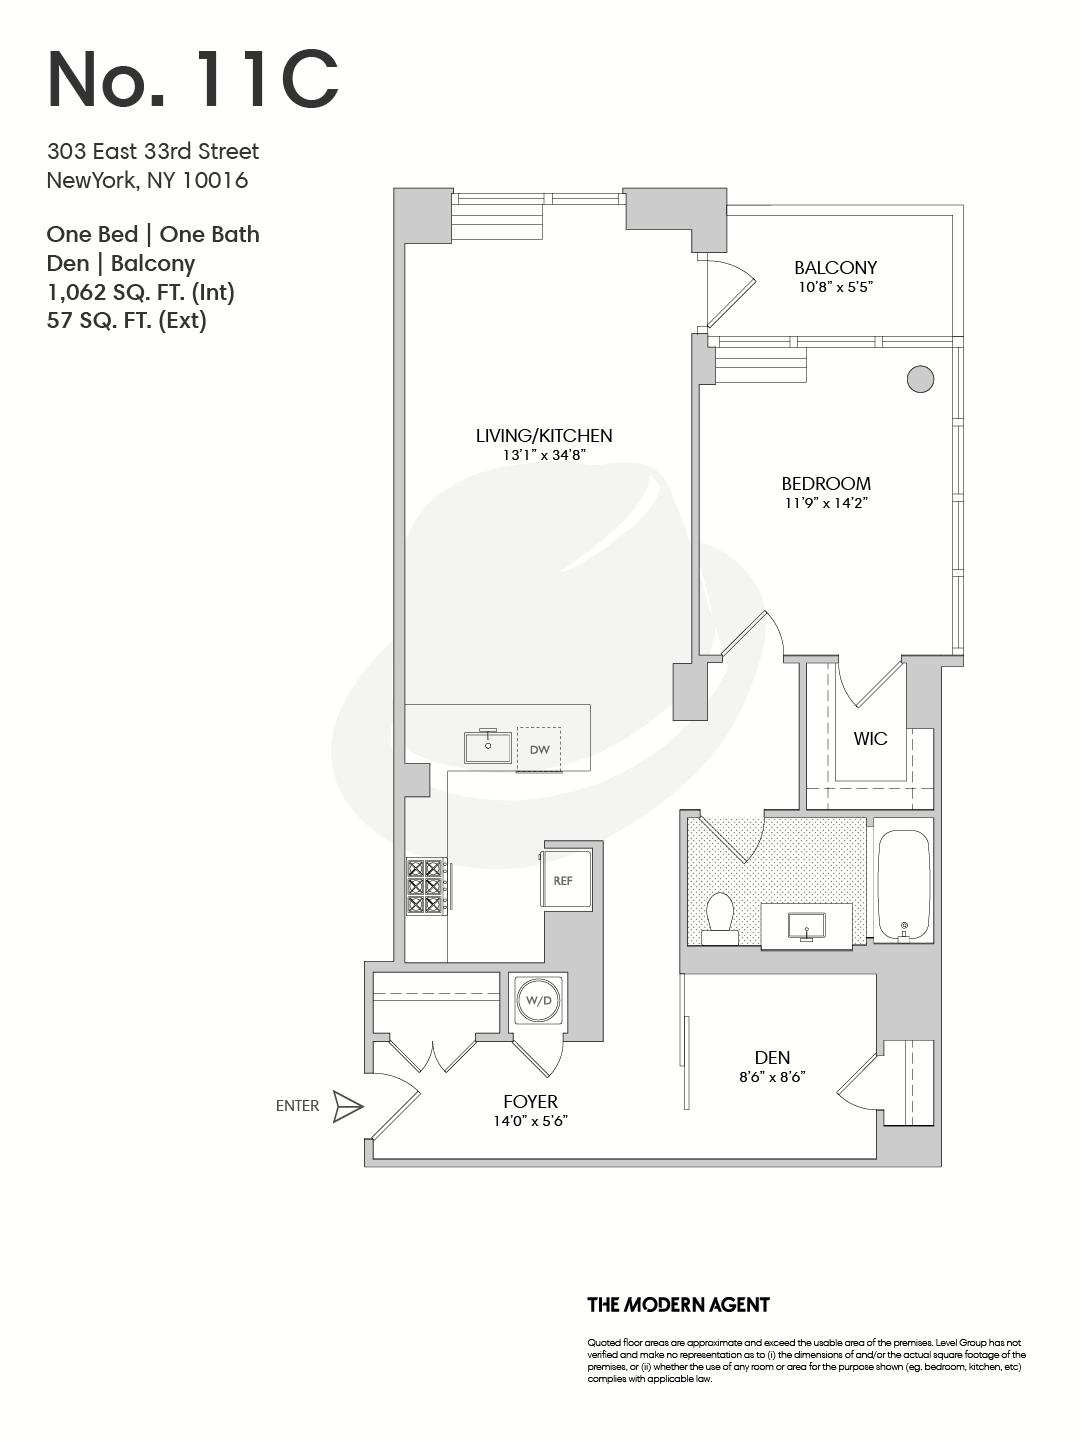 303E33_11C_Floorplan _303E33_5F_Floorplan.png